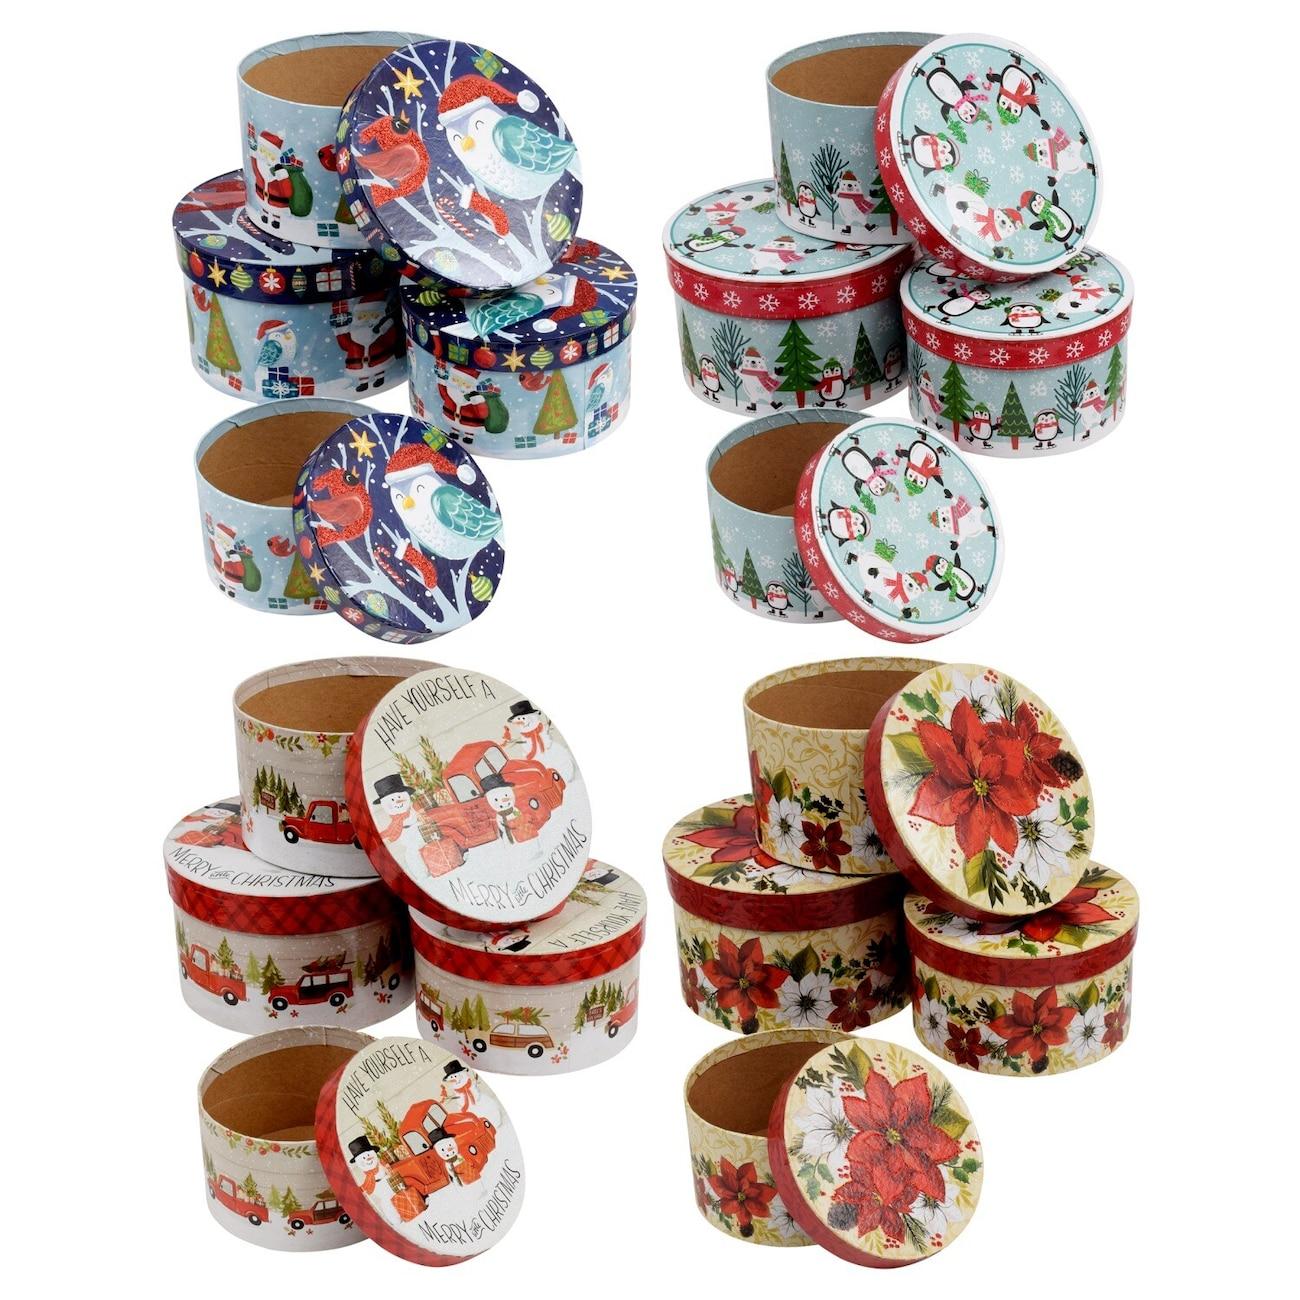 Nesting Gift Boxes - Dollar Tree, Inc.